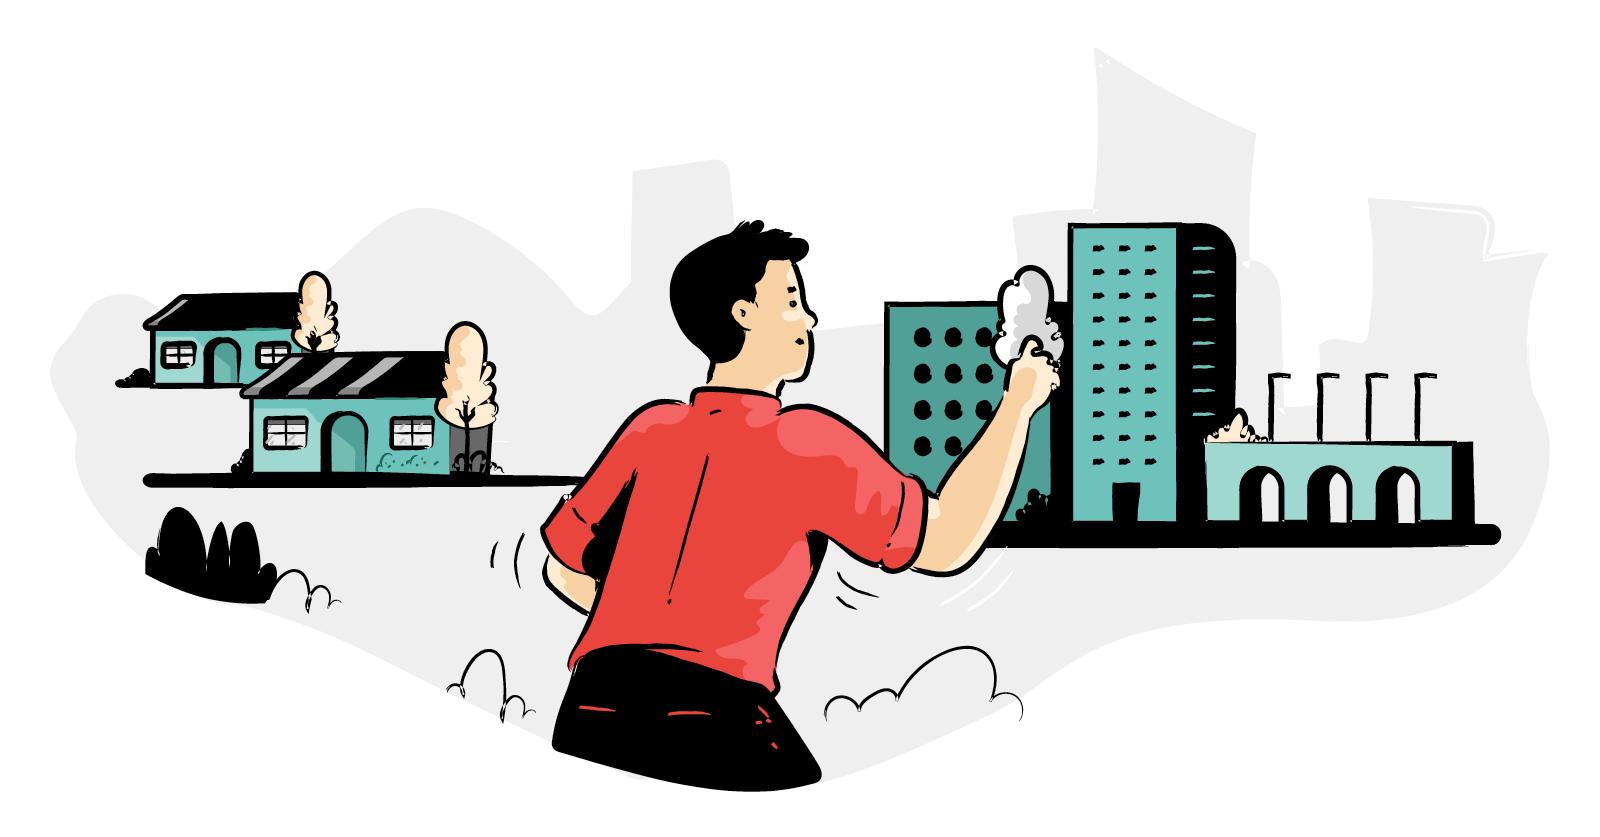 Illustration of man arranging a diorama of a city